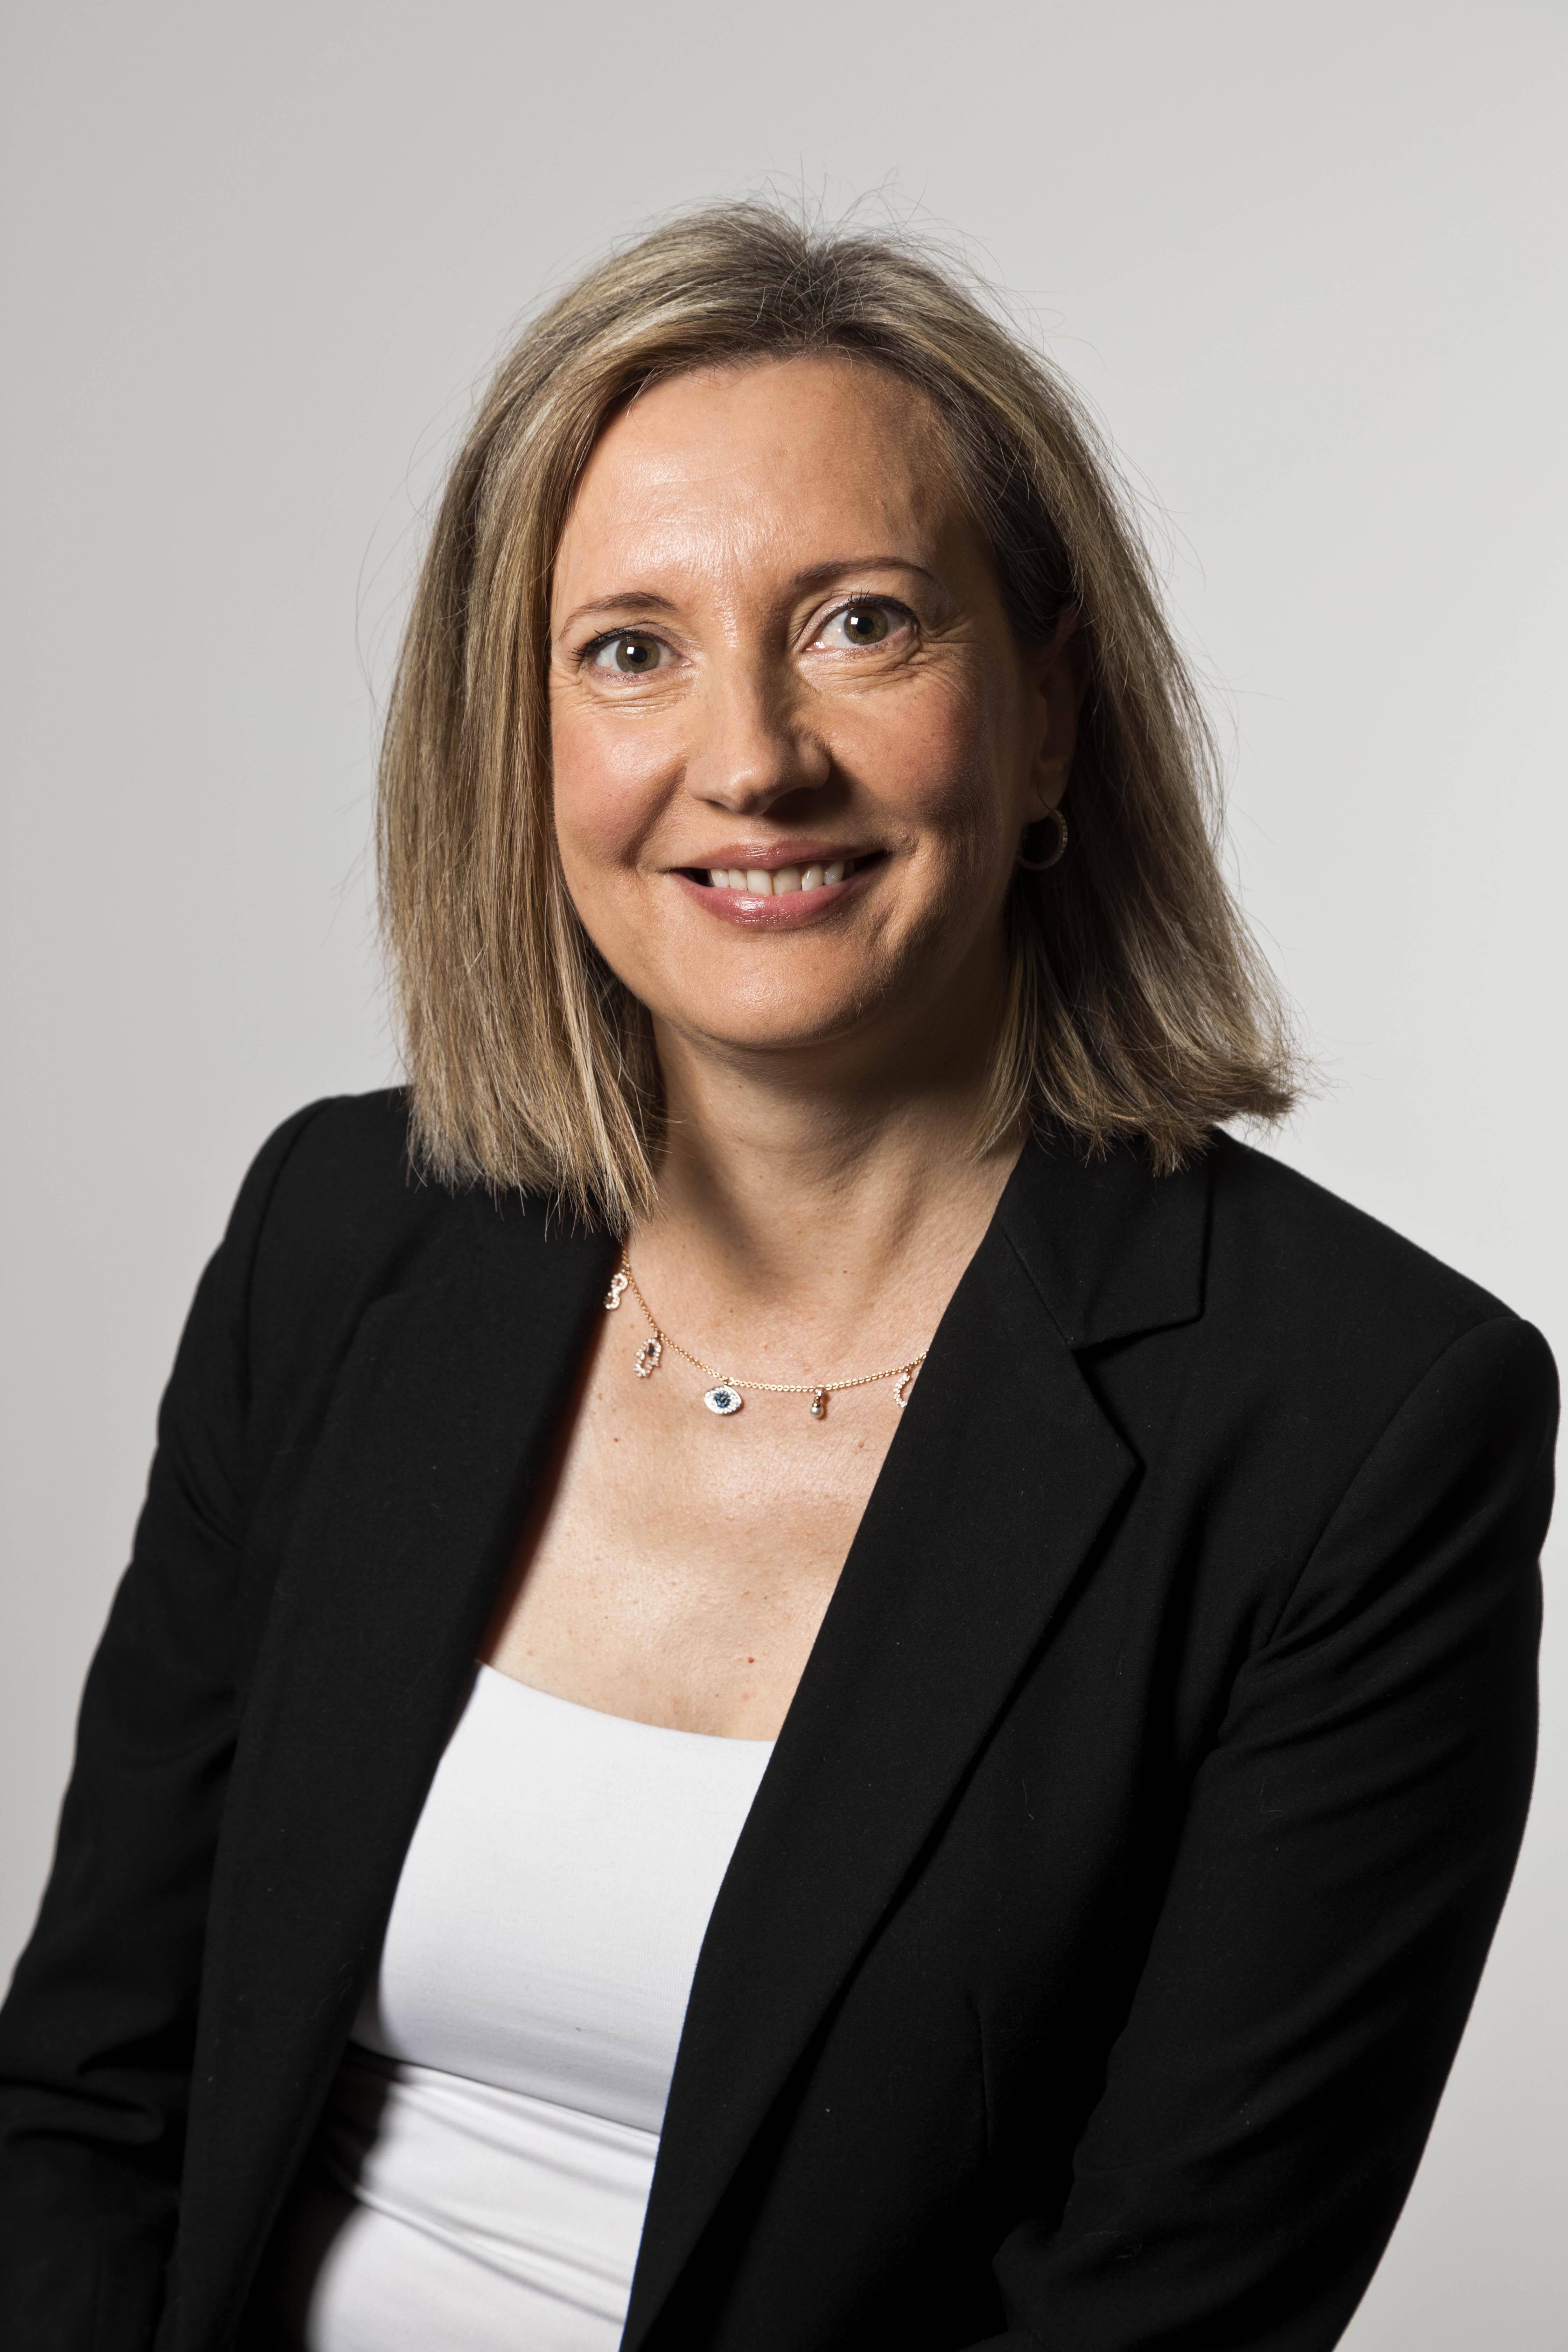 Silvia Ferrer Ghiringhelli